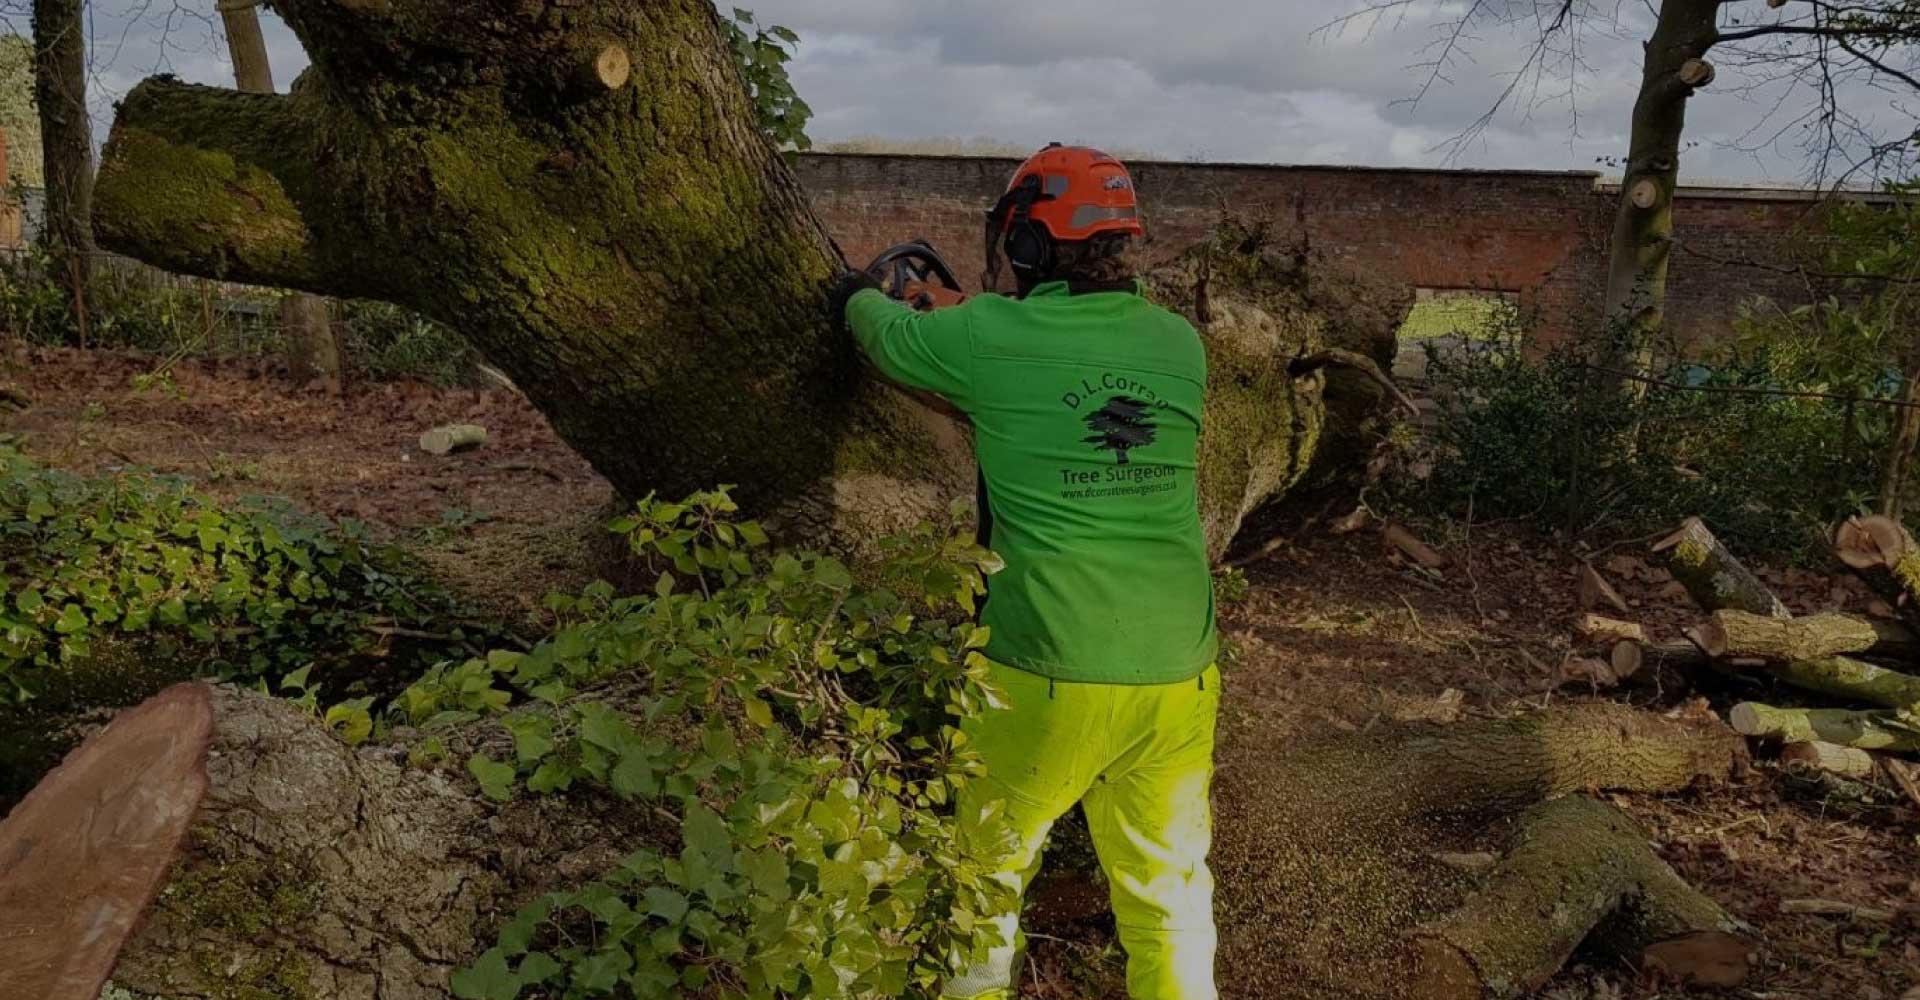 D-L-Corran-Tree-Surgeons-Abergavenny-Slider-3